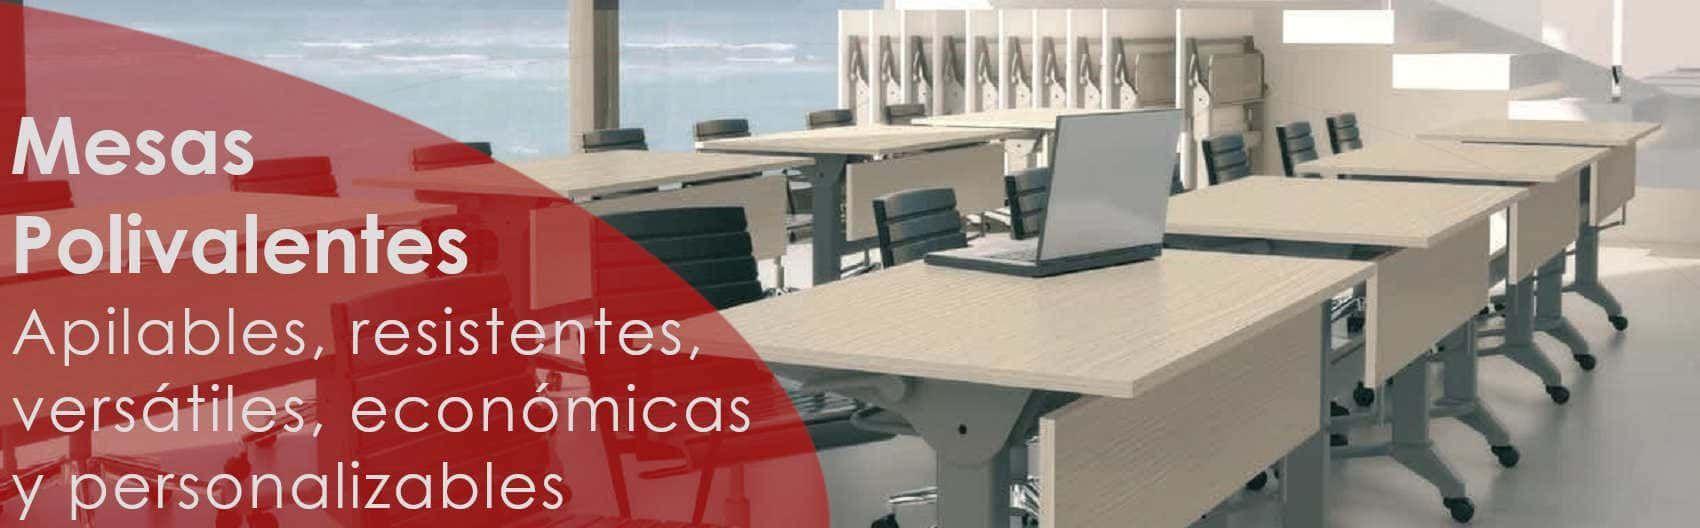 Mesas para adiestramiento muy modernos y duradedos